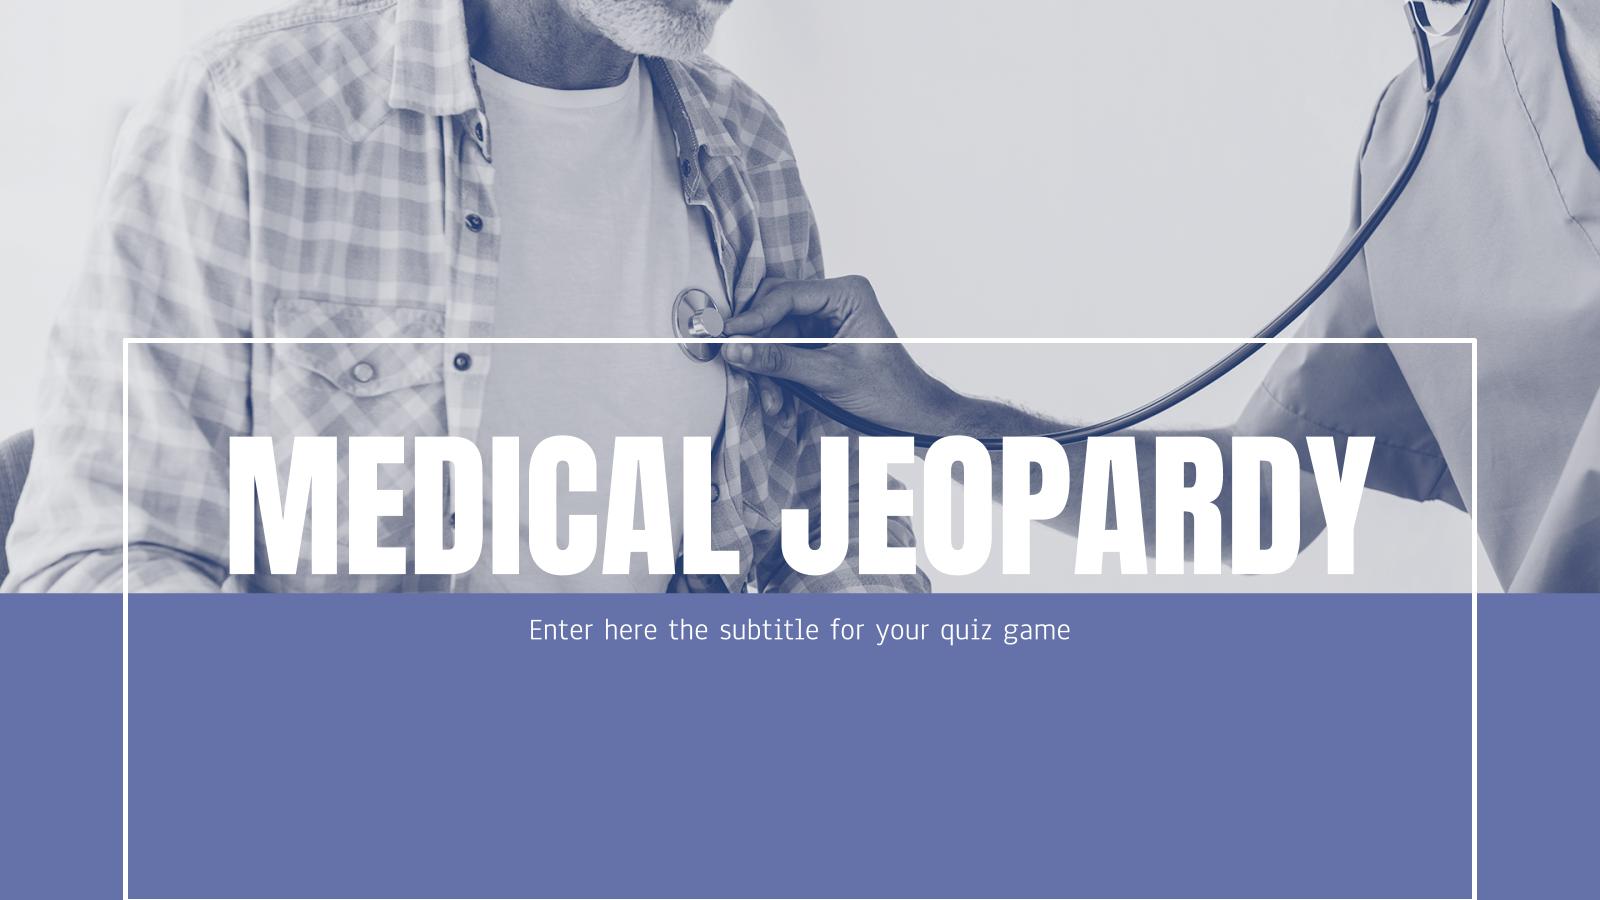 Medical Jeopardy presentation template